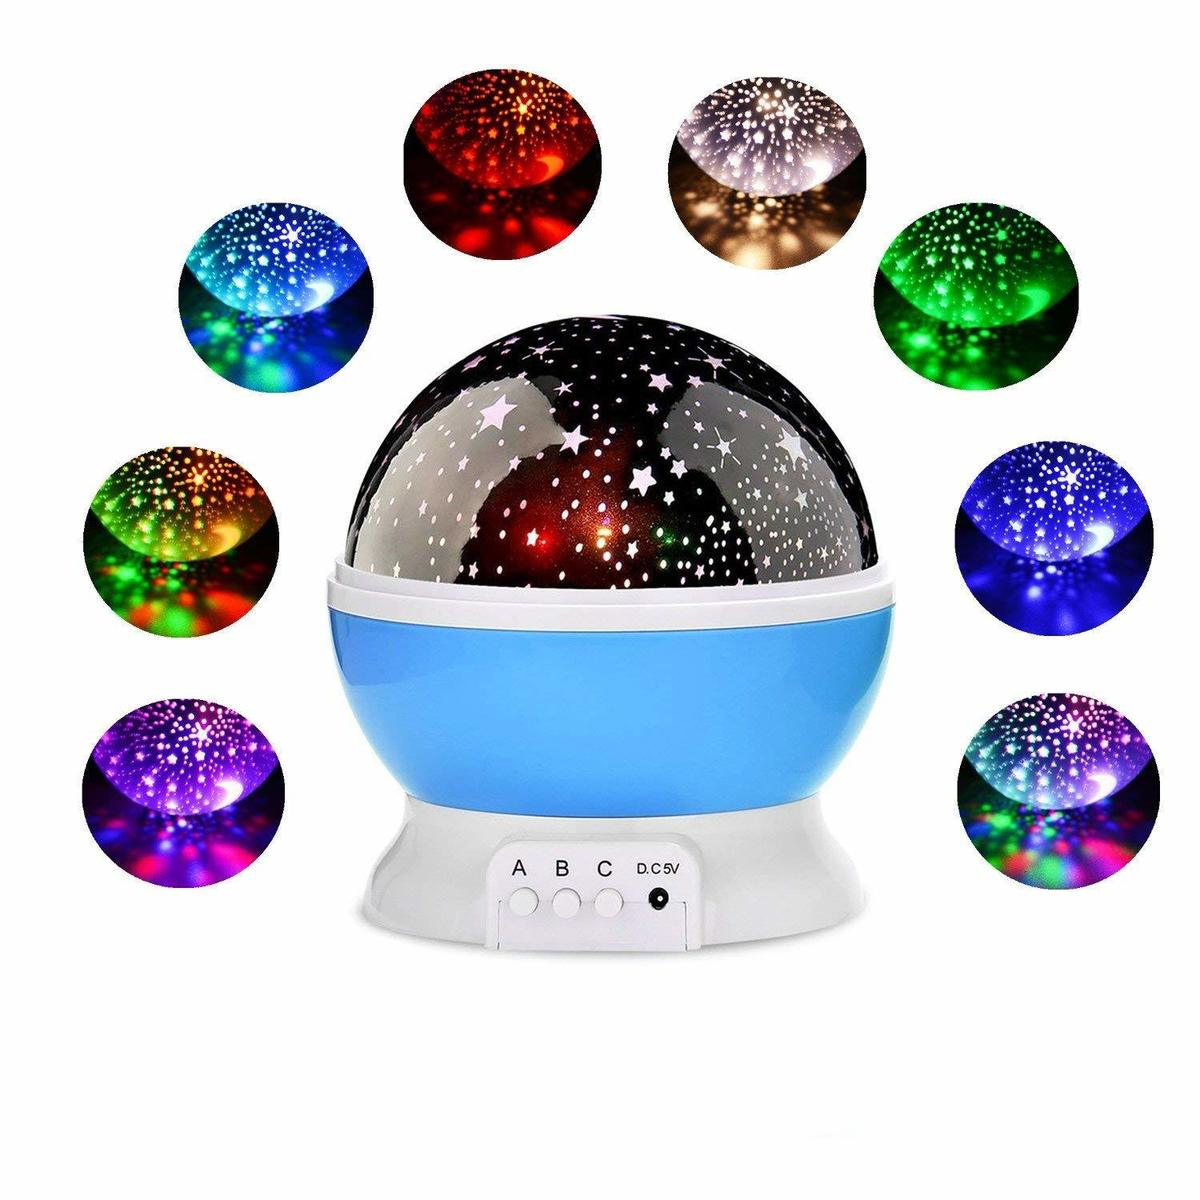 Star Sky Night Light LED Rotierenden Projektor Neuheit Beleuchtung Kinder Baby Kindergarten Batterie Betrieben Romantische Mond Cosmos Lampe Geschenk